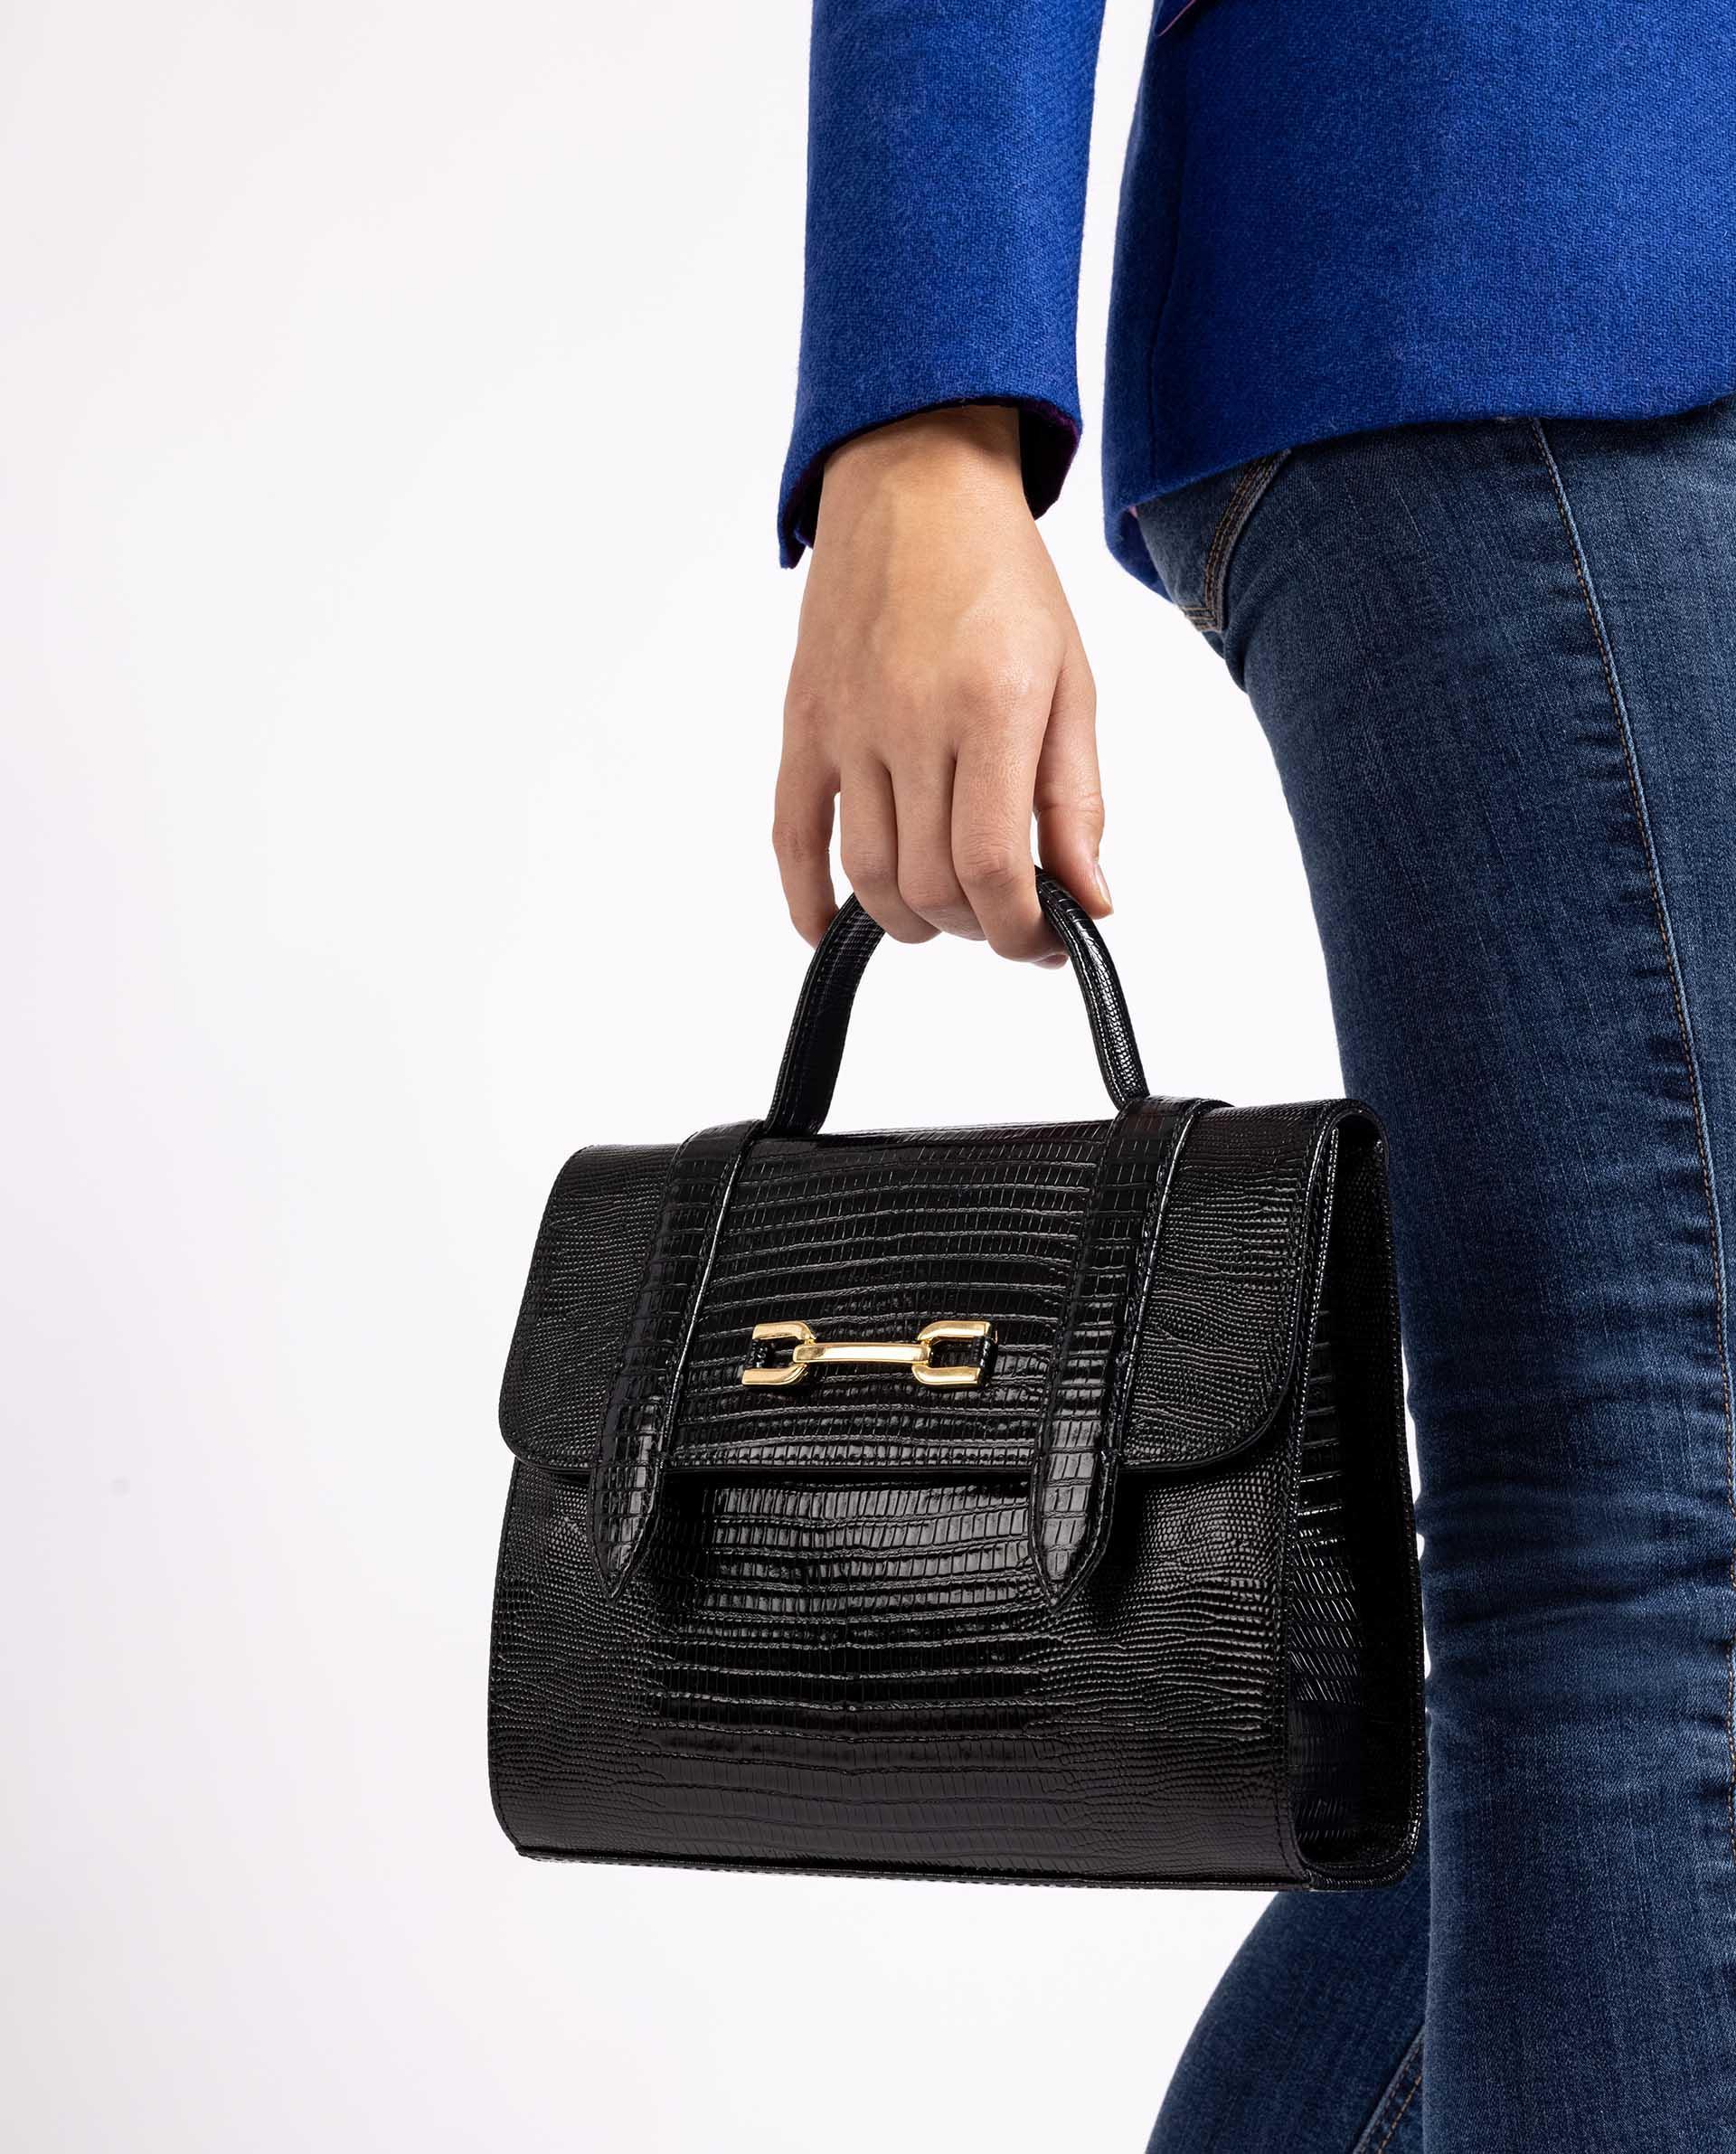 Unisa Small-handbag ZERMINE_LU black